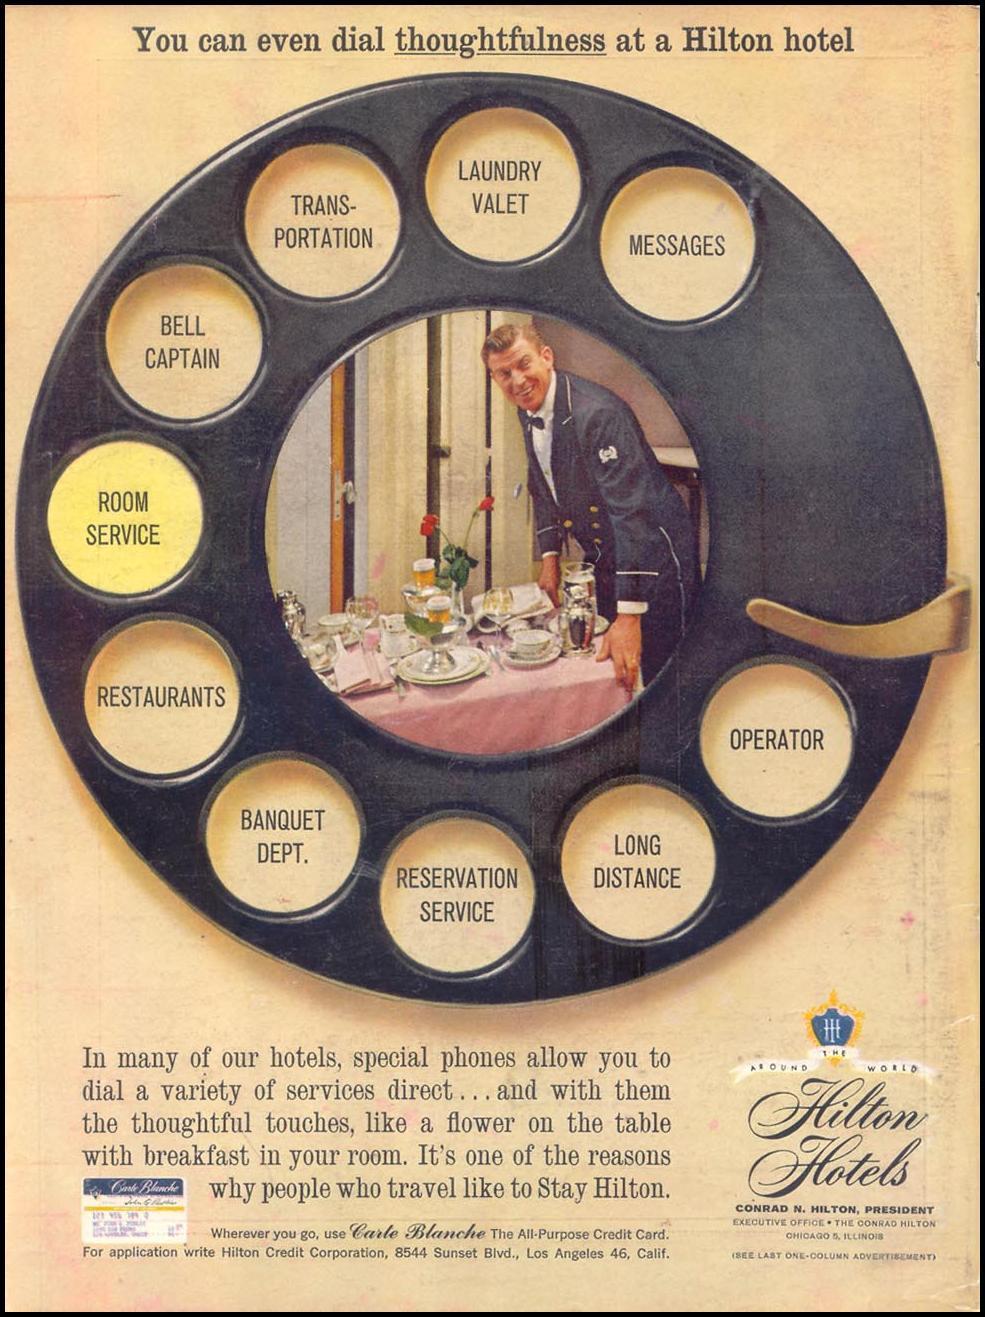 Clint Stevens Hotel Ads Hilton Hotels Retro Ads